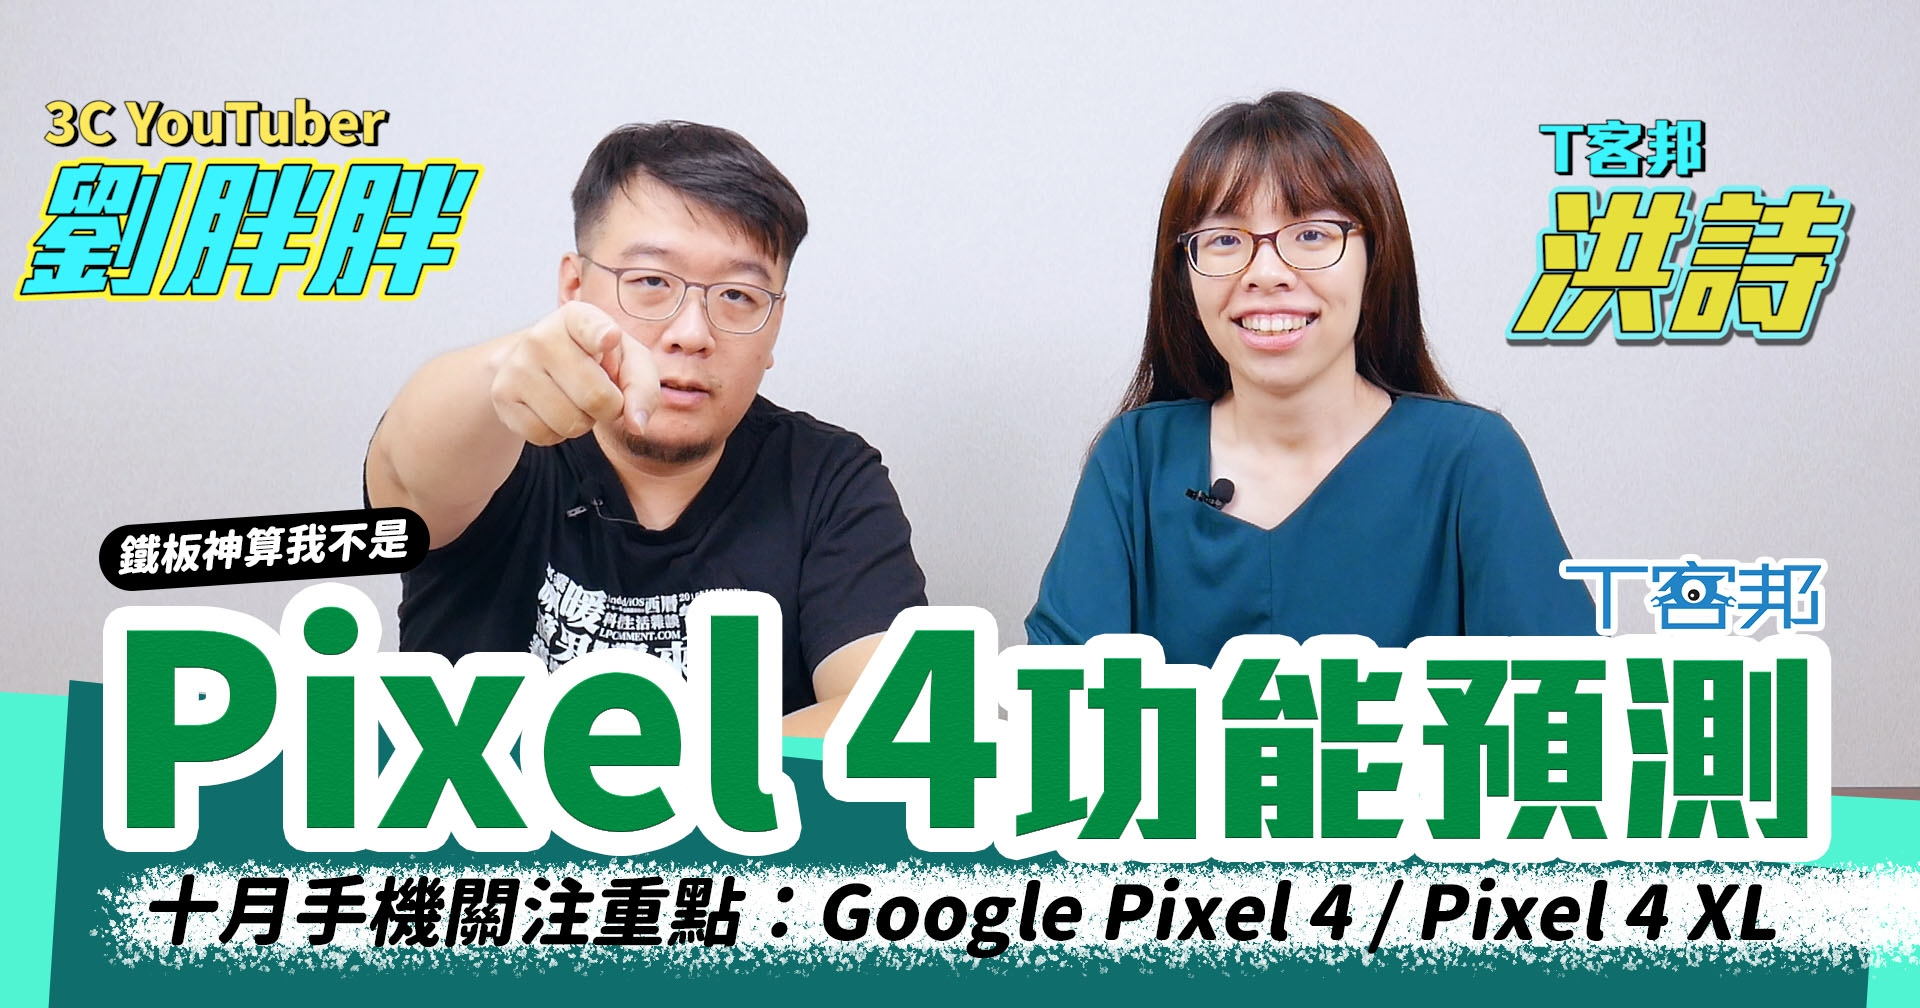 Google Pixel 4 新機功能整理,隔空手勢操作?更強大的夜拍?新人工智慧處理器?